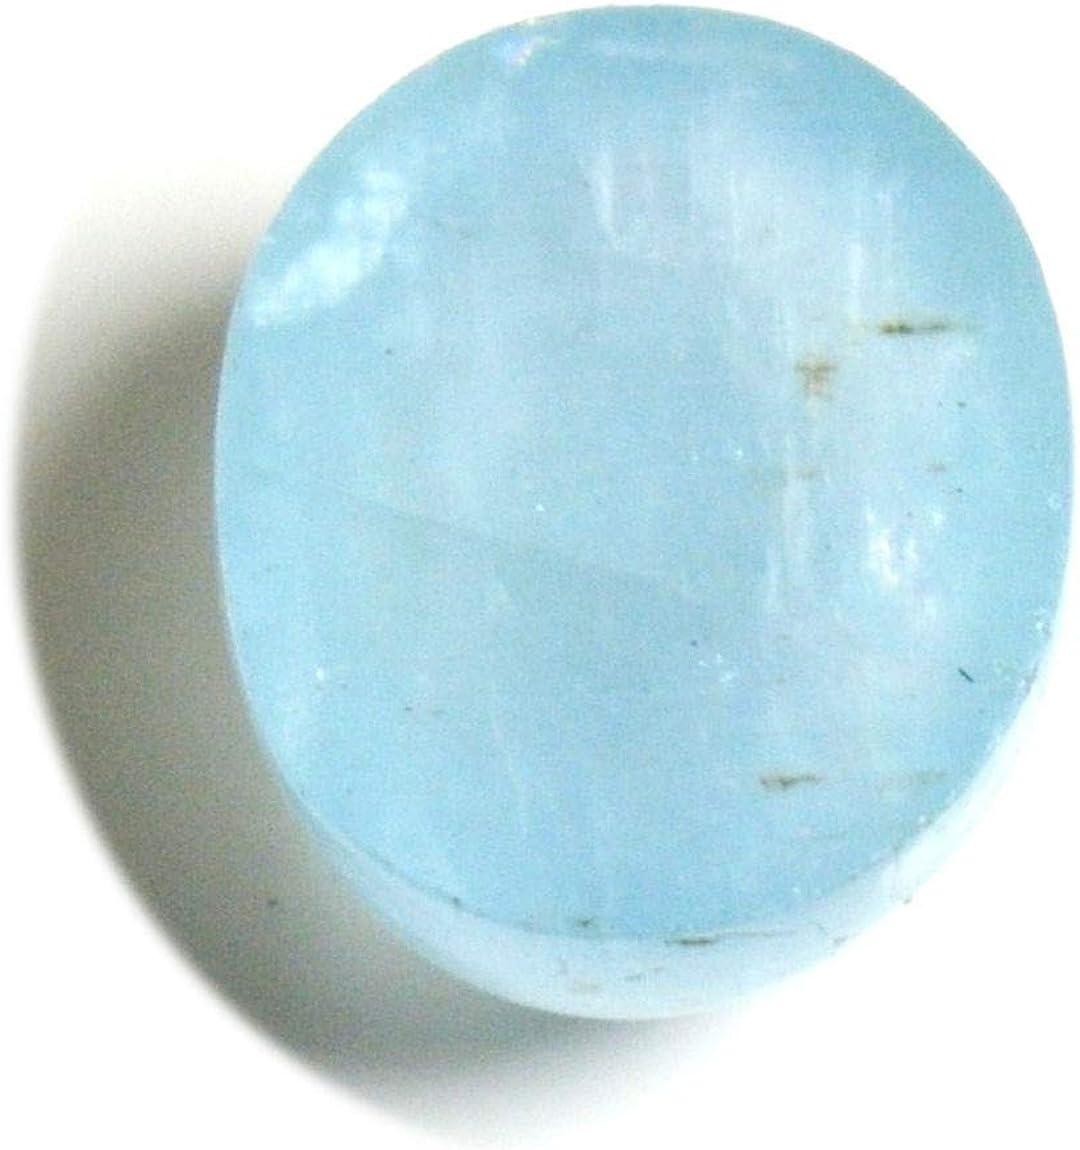 Aquamarine Gemstone Cabochon-Natural Aquamarine Faceted One Side Rose Cut Oval Cabochon-20x16 MM-3 Pcs-High Quality-Wholesalegems #W18273